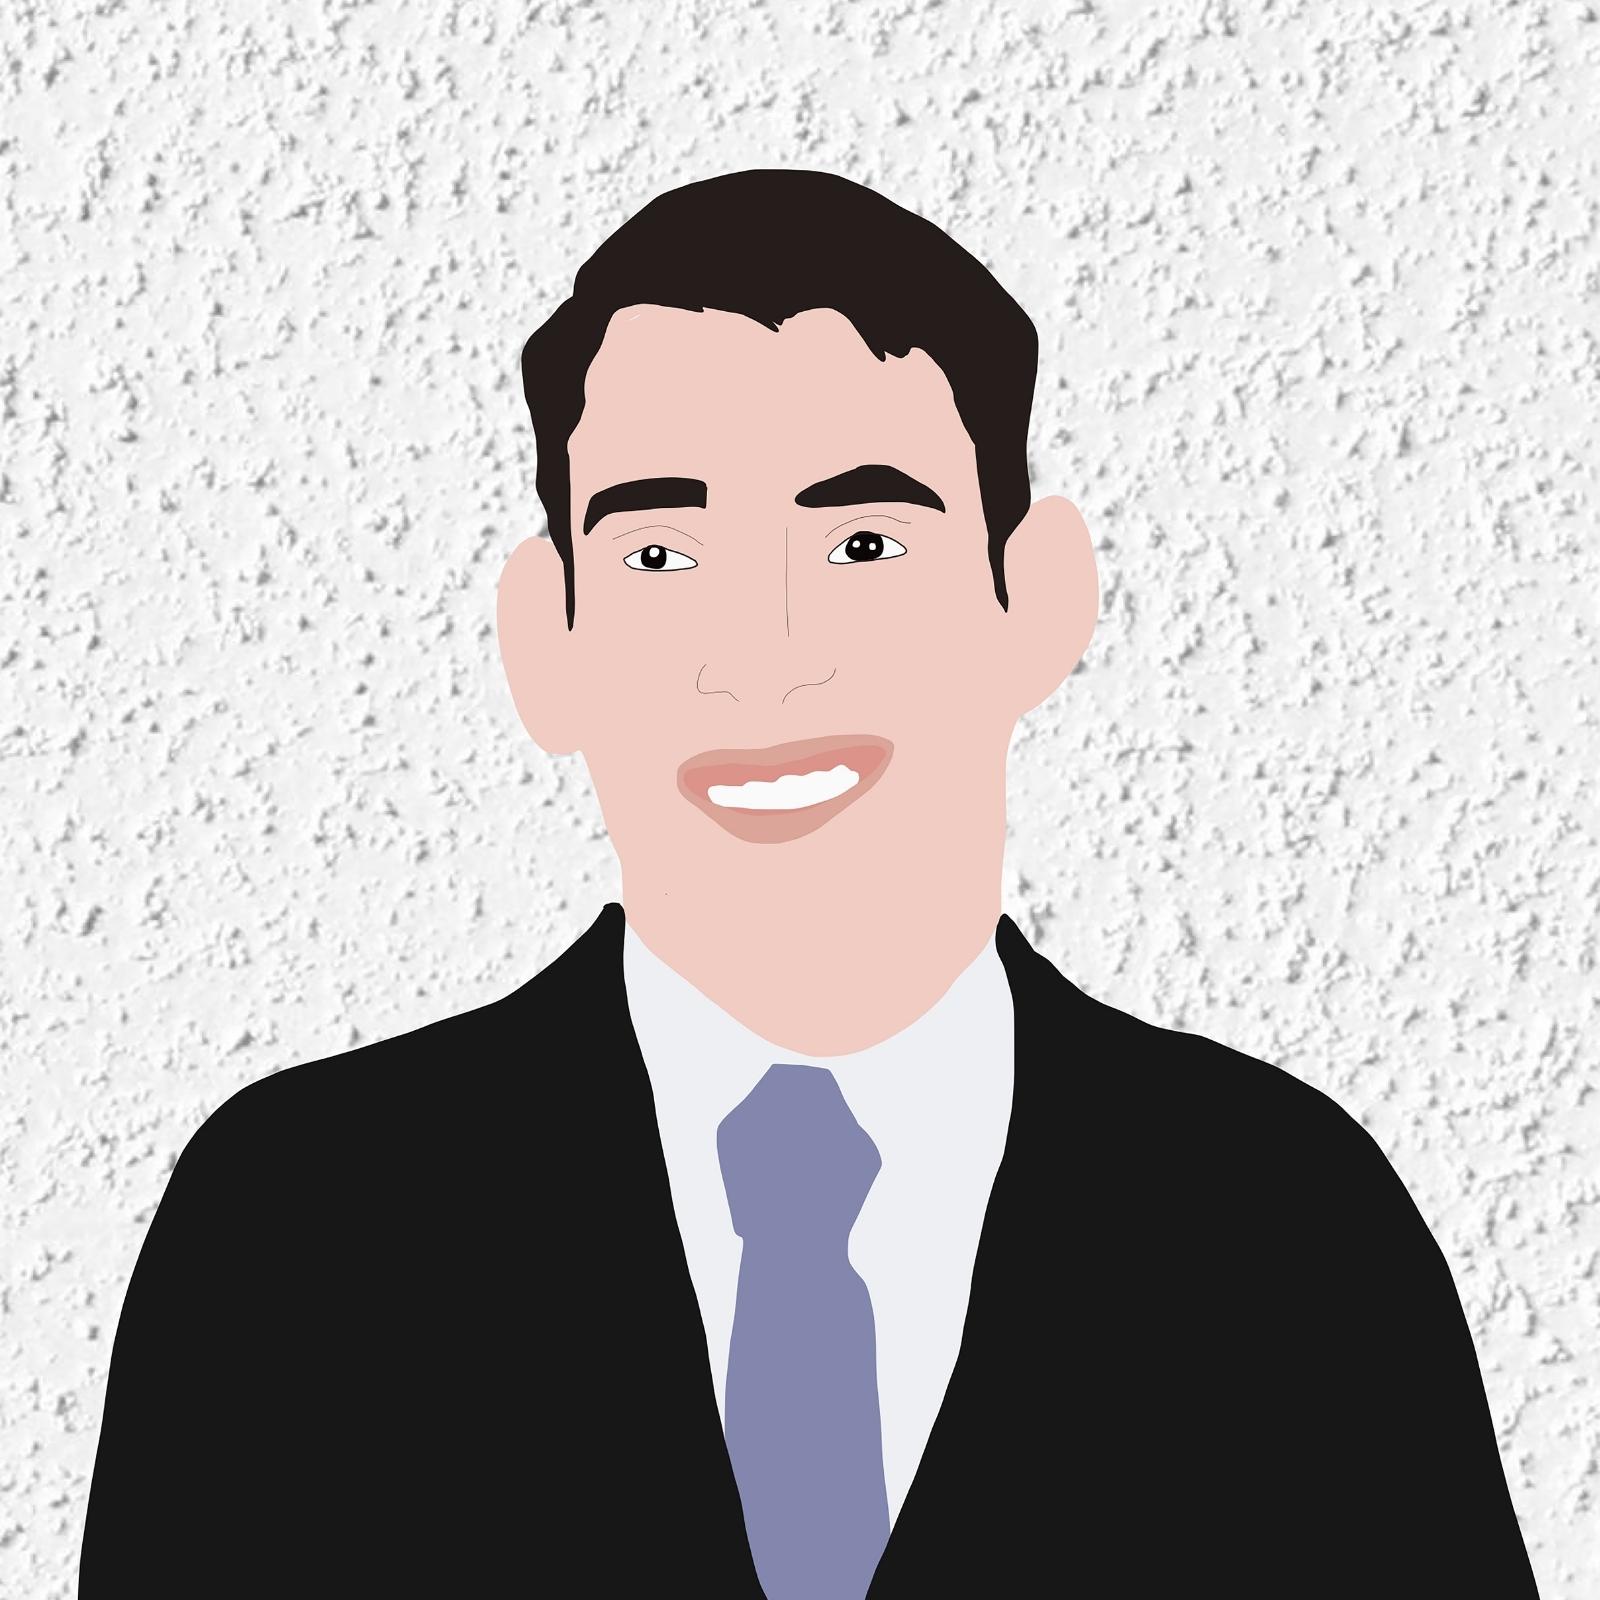 Digital illustration of Stephen smiling against a white stucco background.